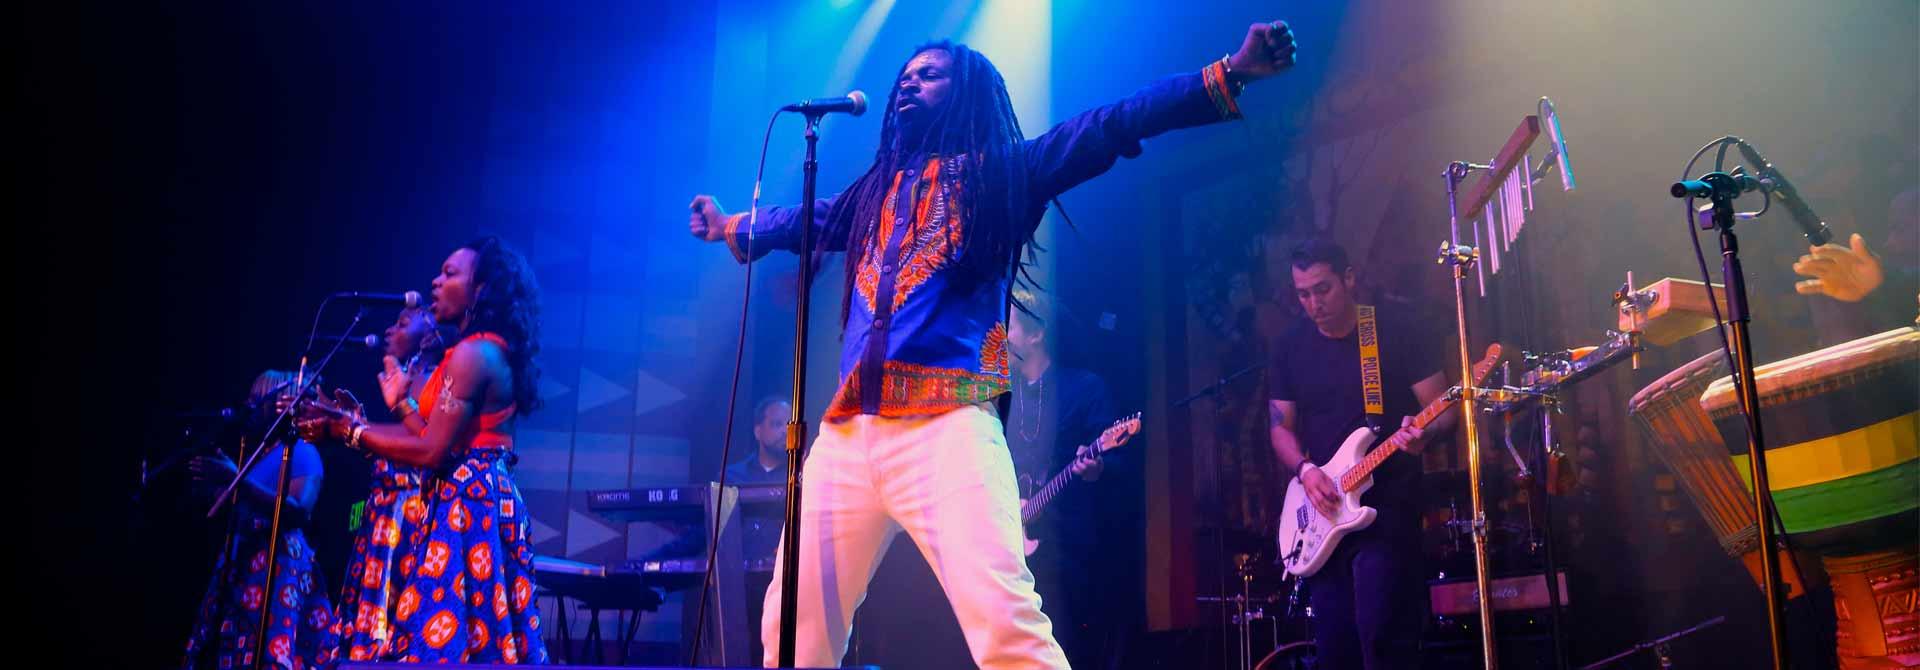 Afro Roots Artist Rocky Dawuni